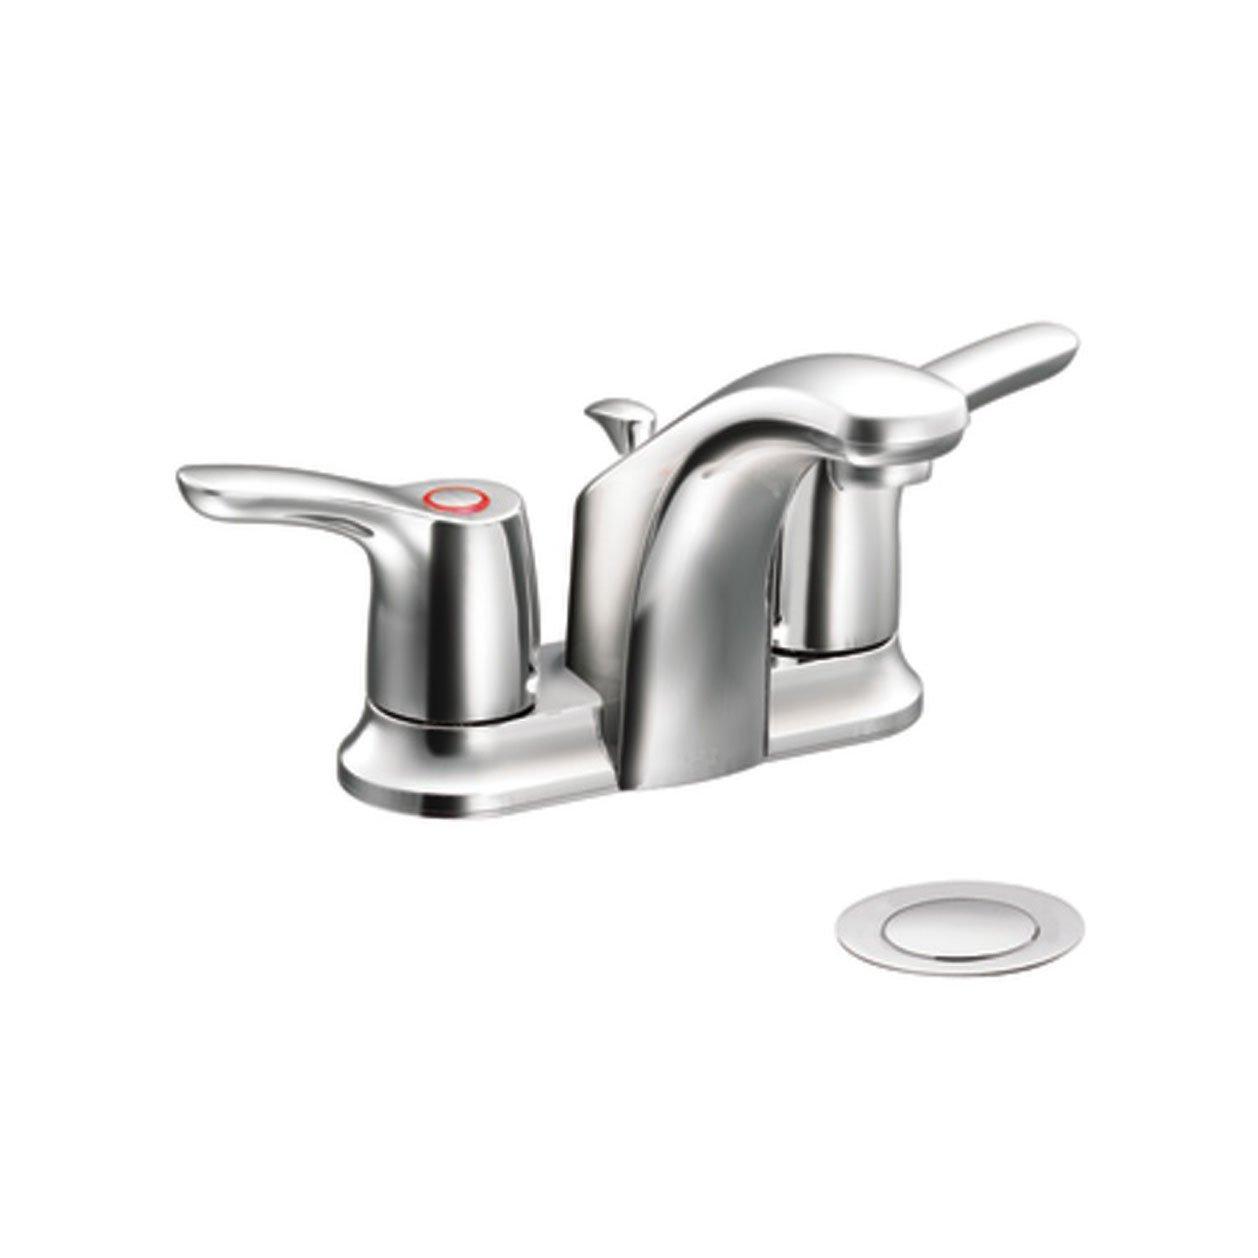 Surplus Bathroom Fixtures: Cleveland Faucets Ca42211 Baystone Centerset Bathroom Sink